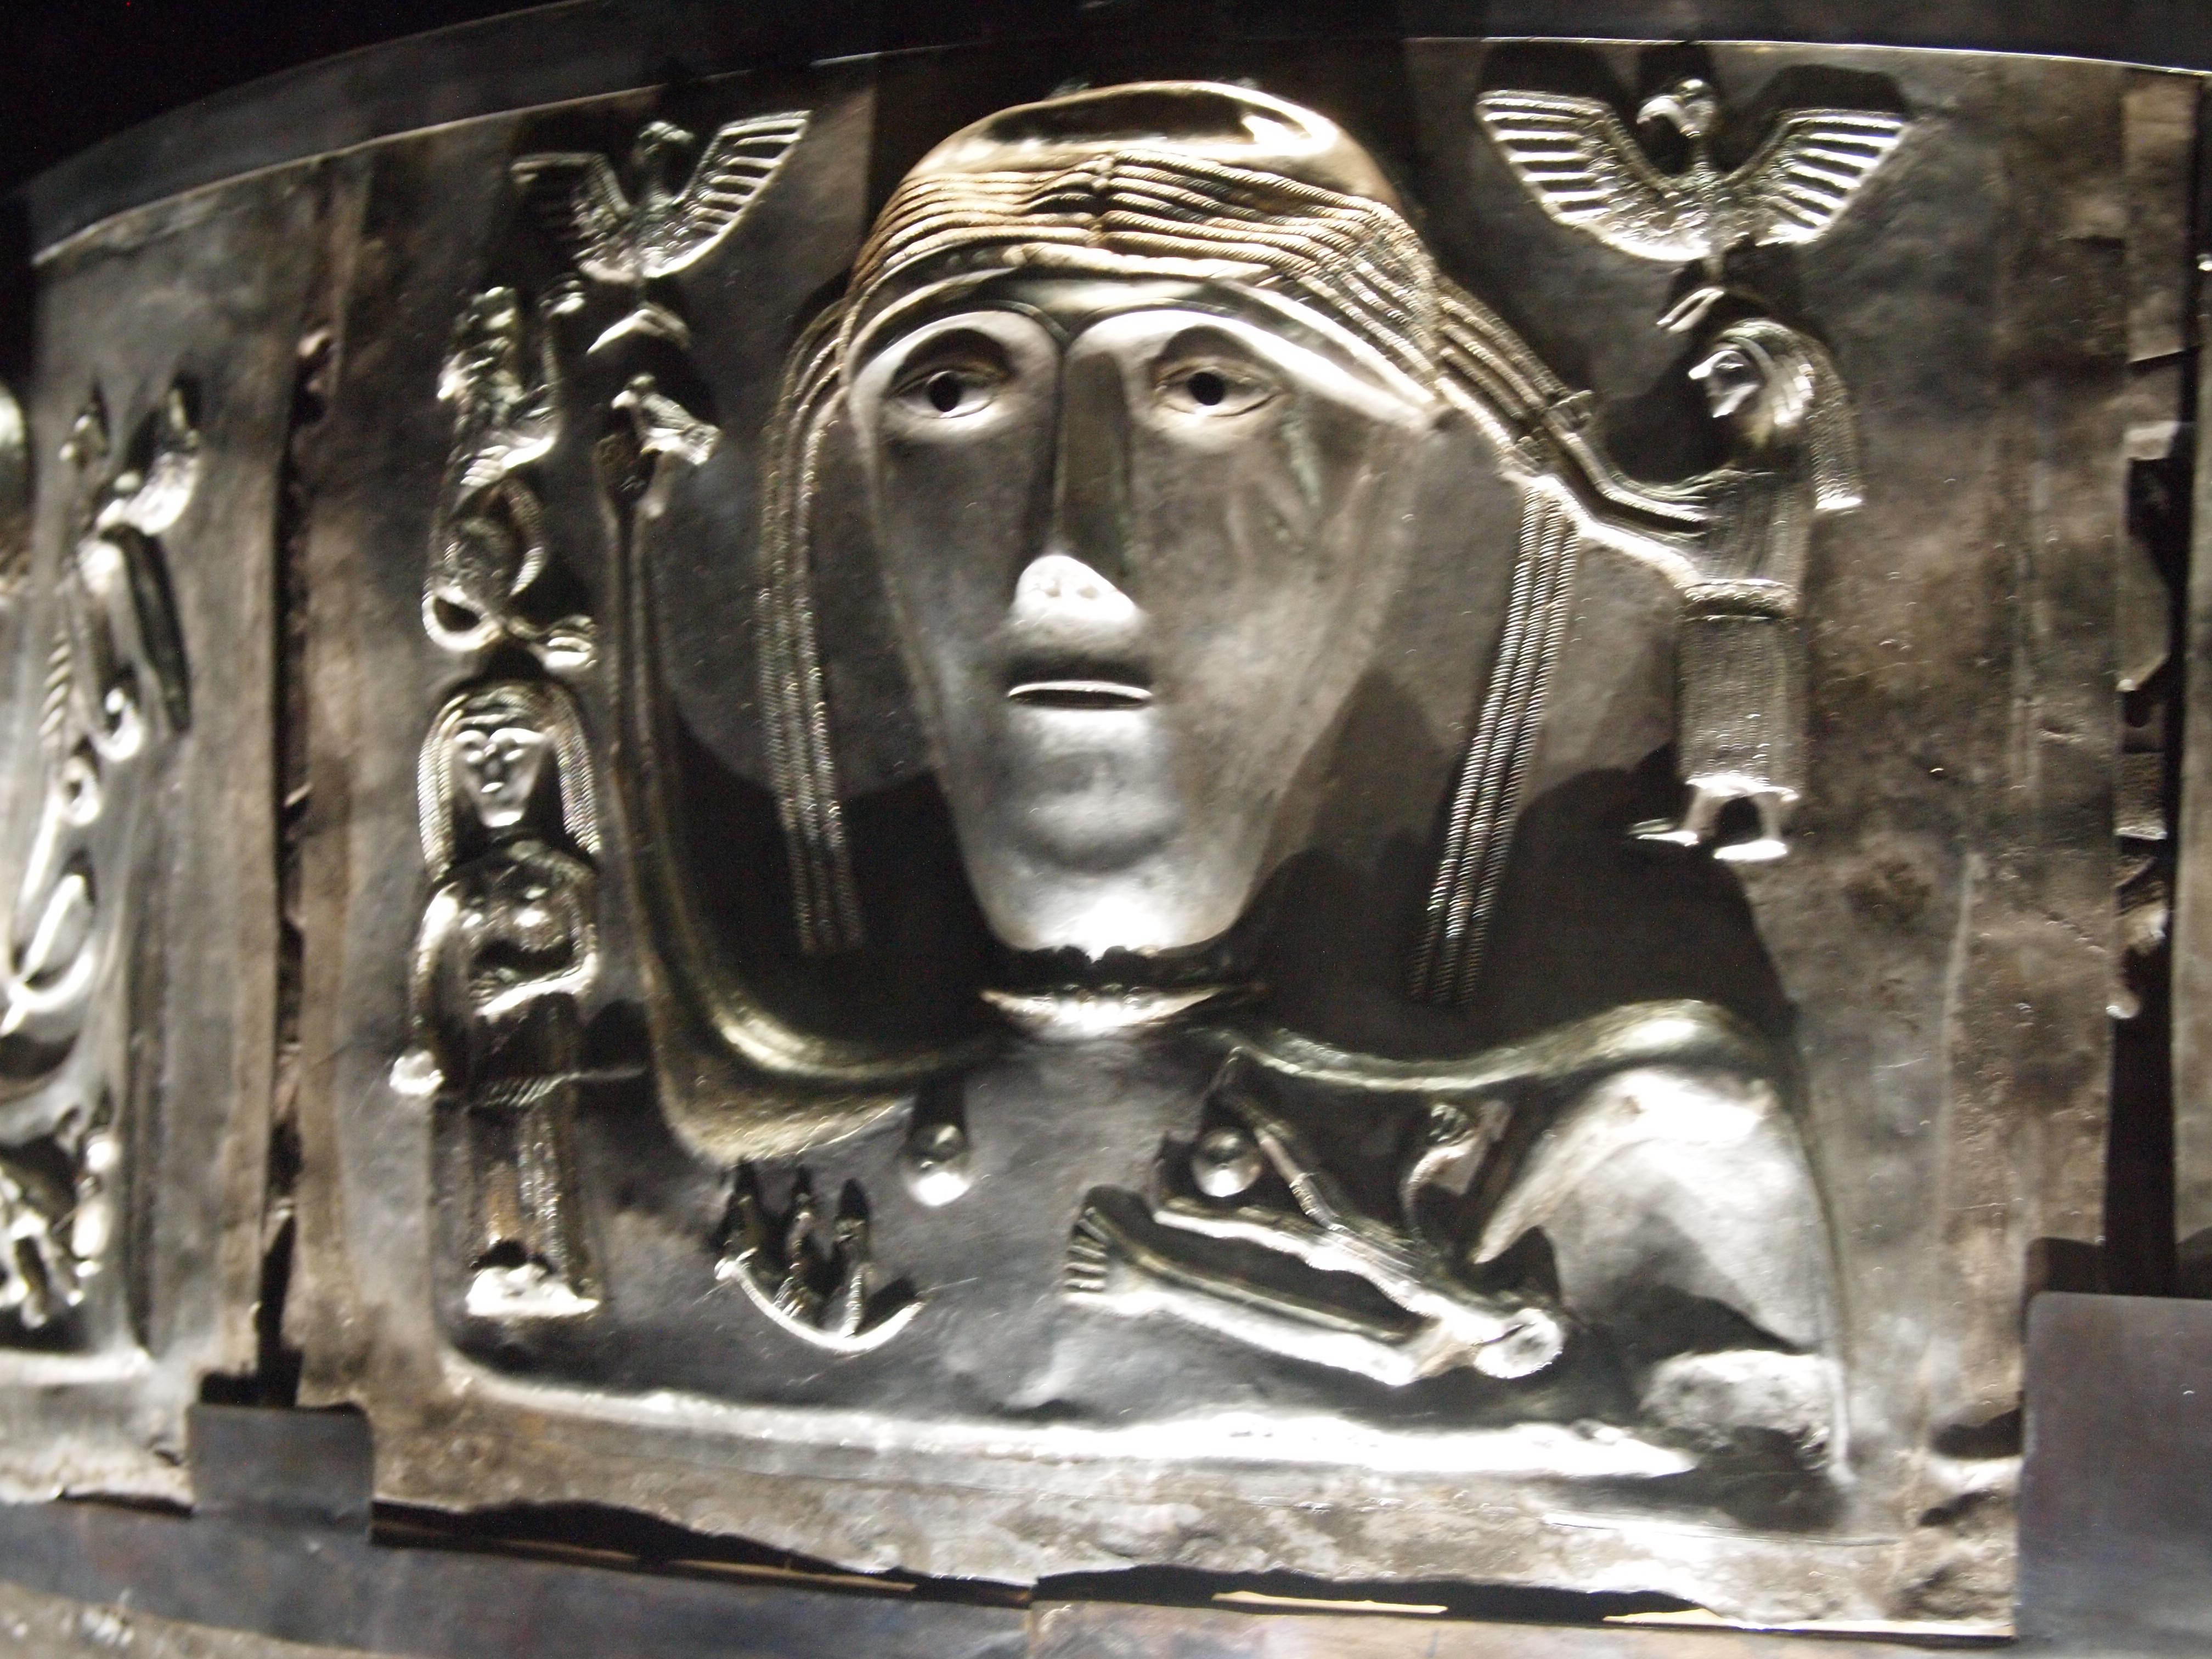 INVESTIGACIÓN SOBRE EL 'BAPHOMET' Detail_2_from_Gundestrupkarret